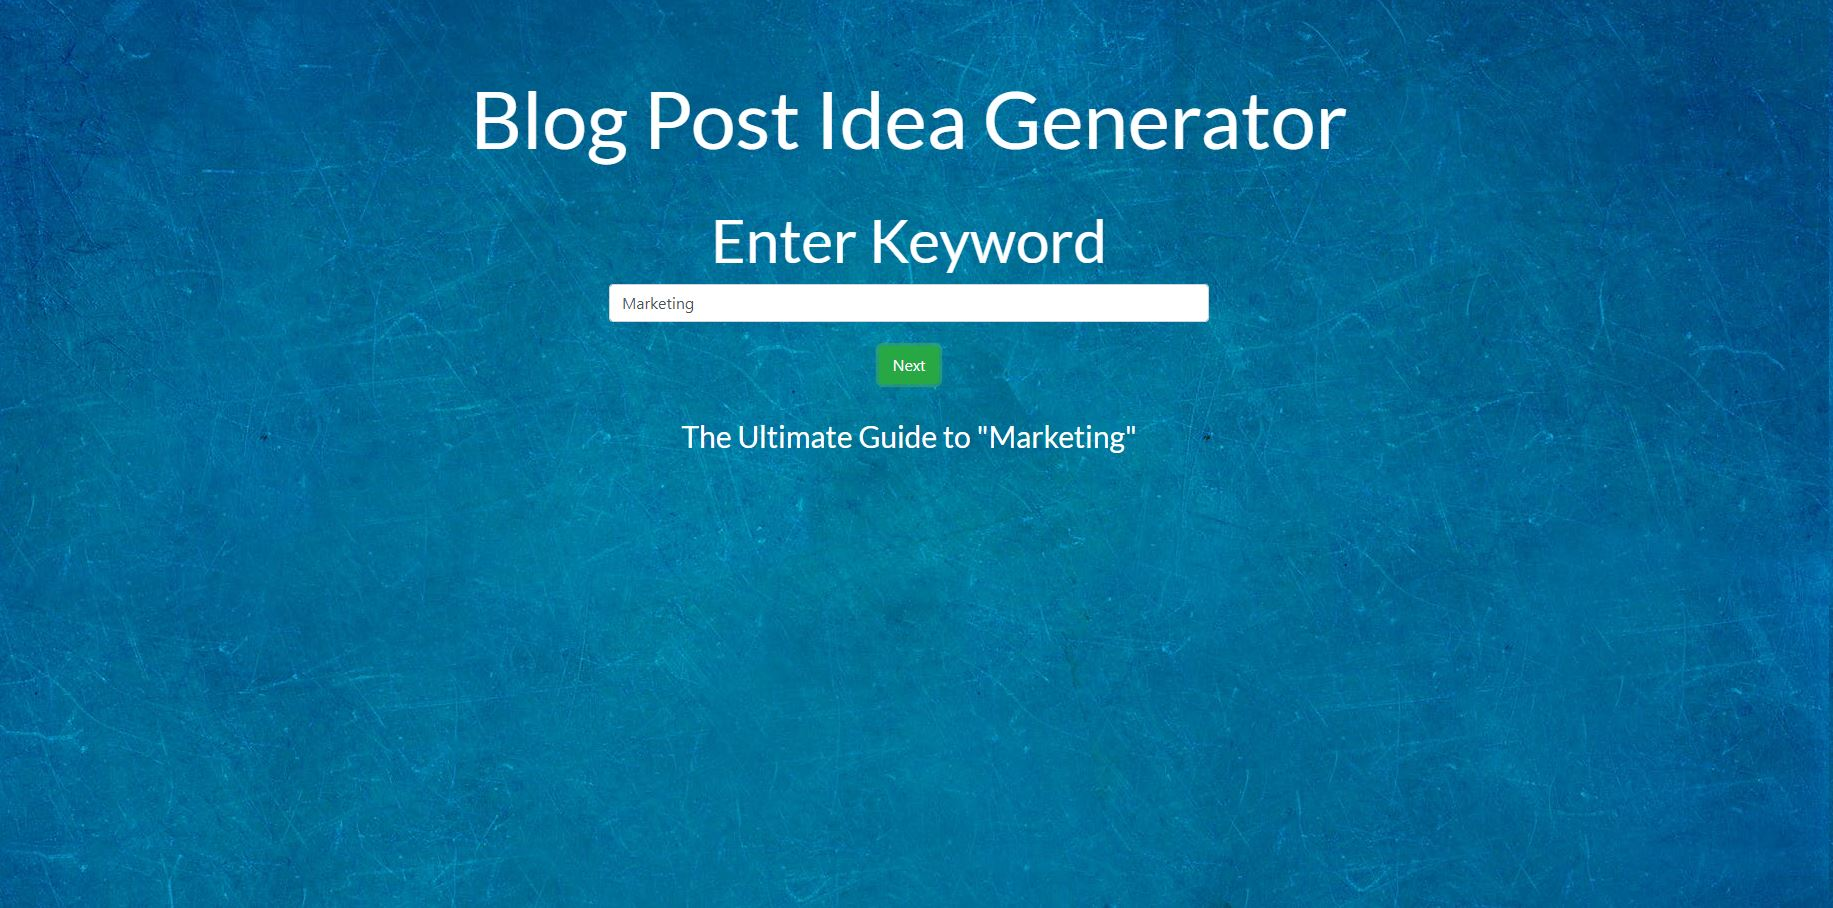 Blog post idea generator results